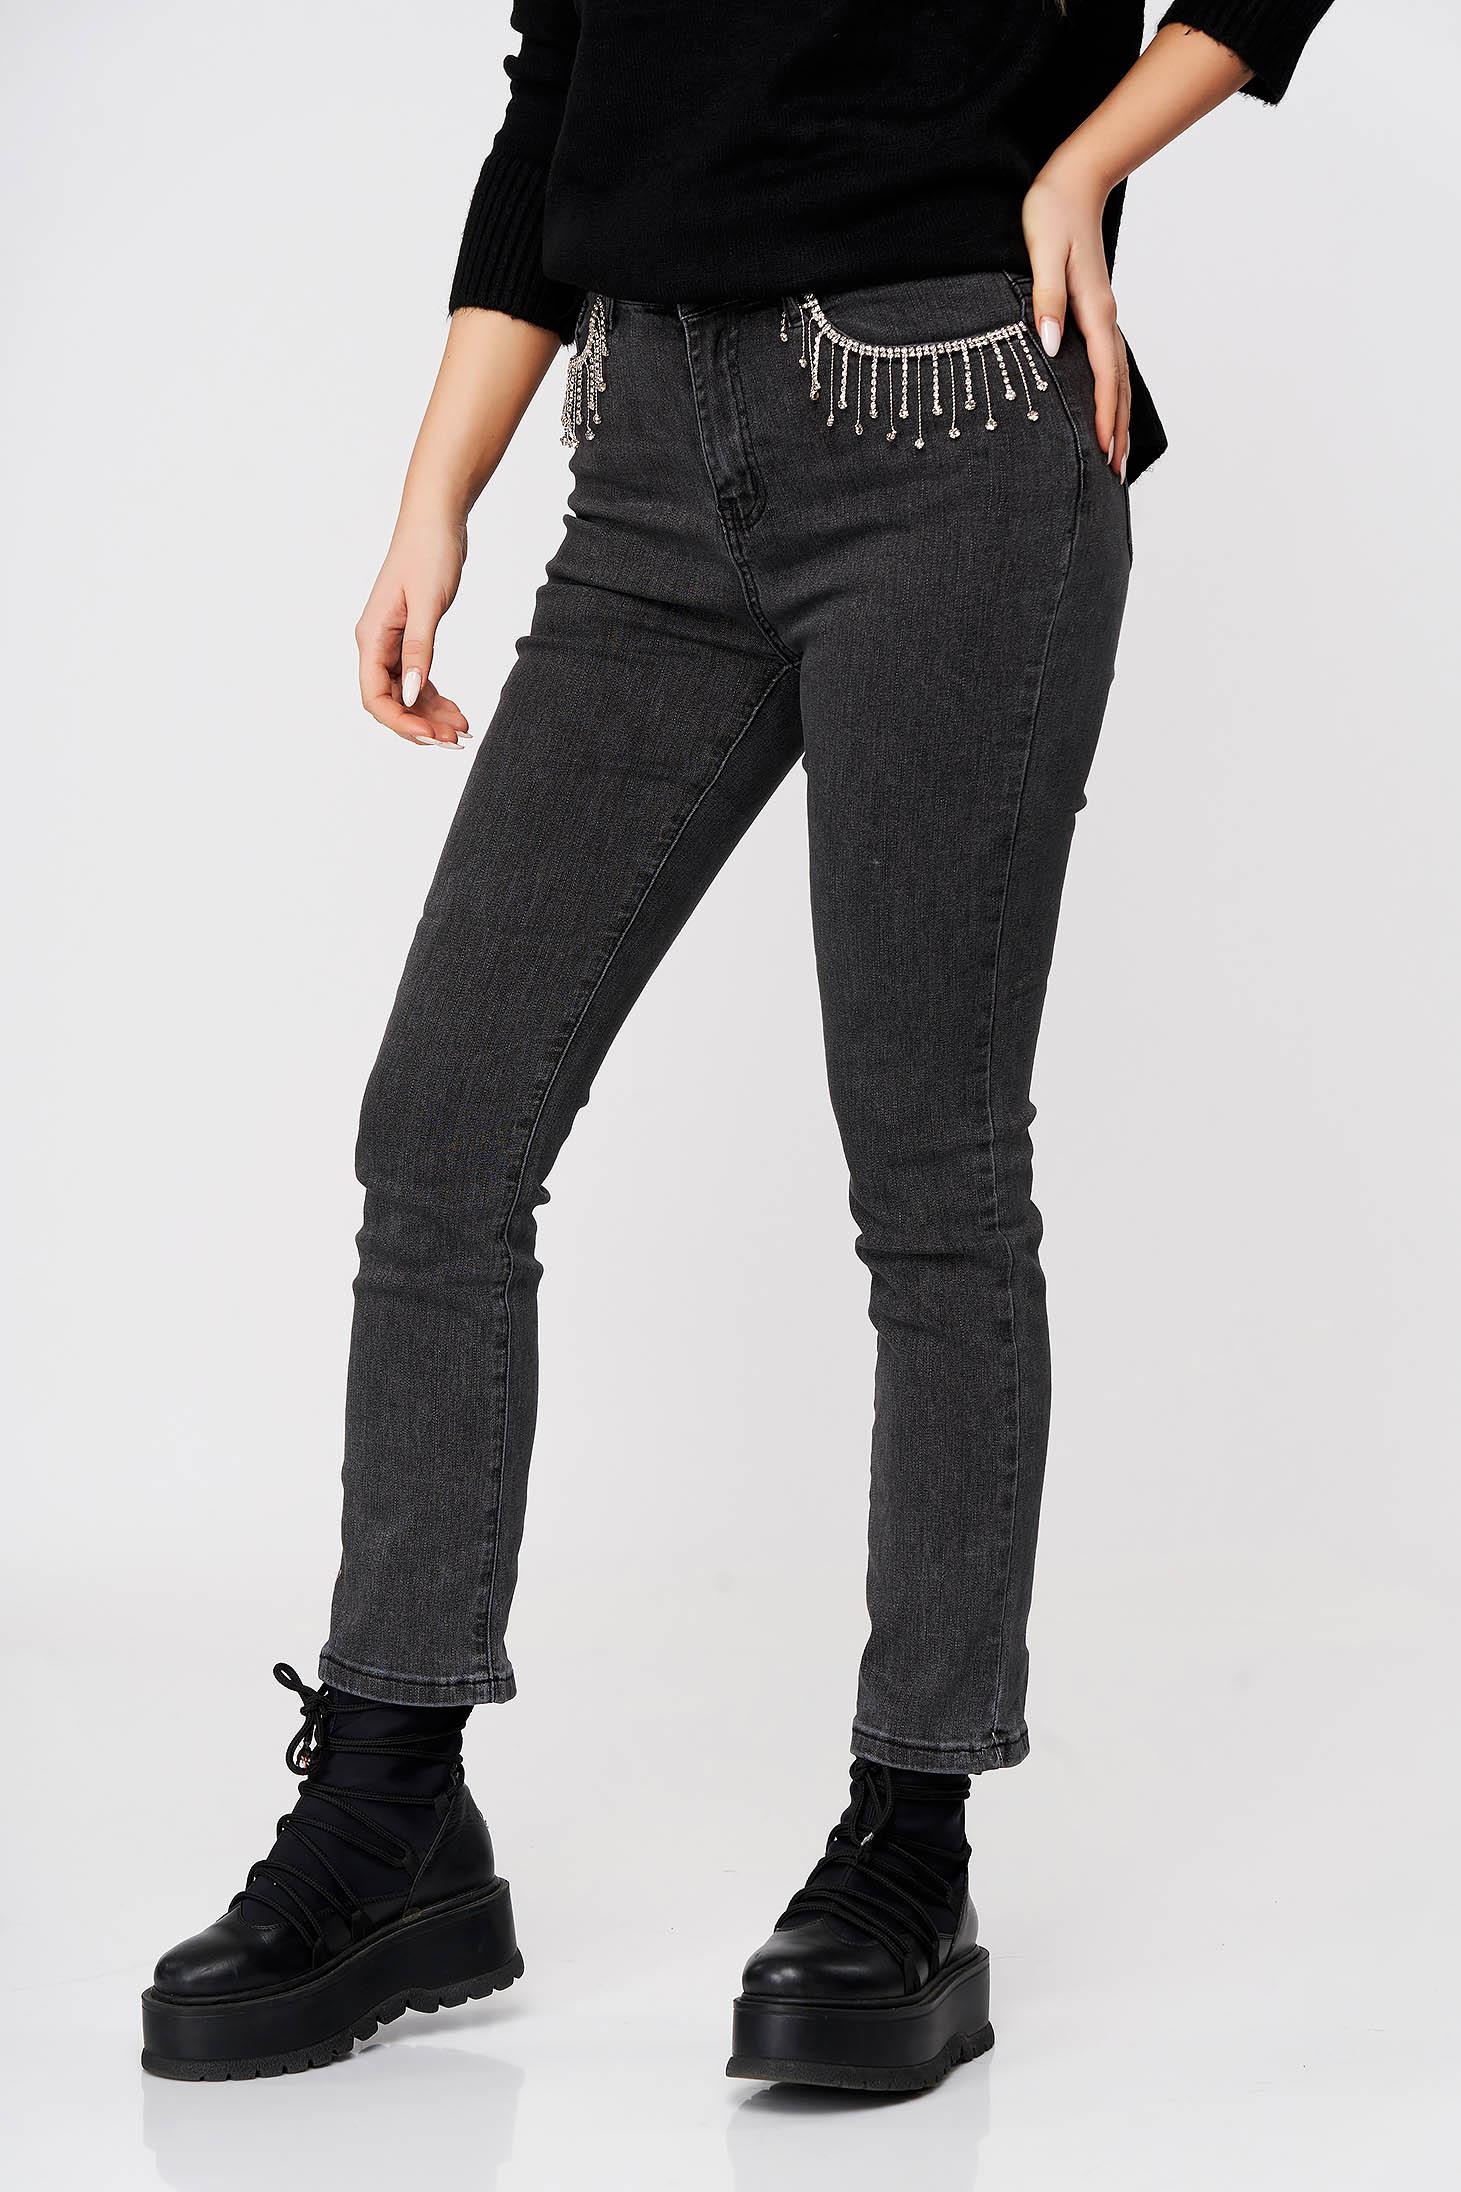 Darkgrey jeans casual skinny jeans medium waist slightly elastic cotton with crystal embellished details